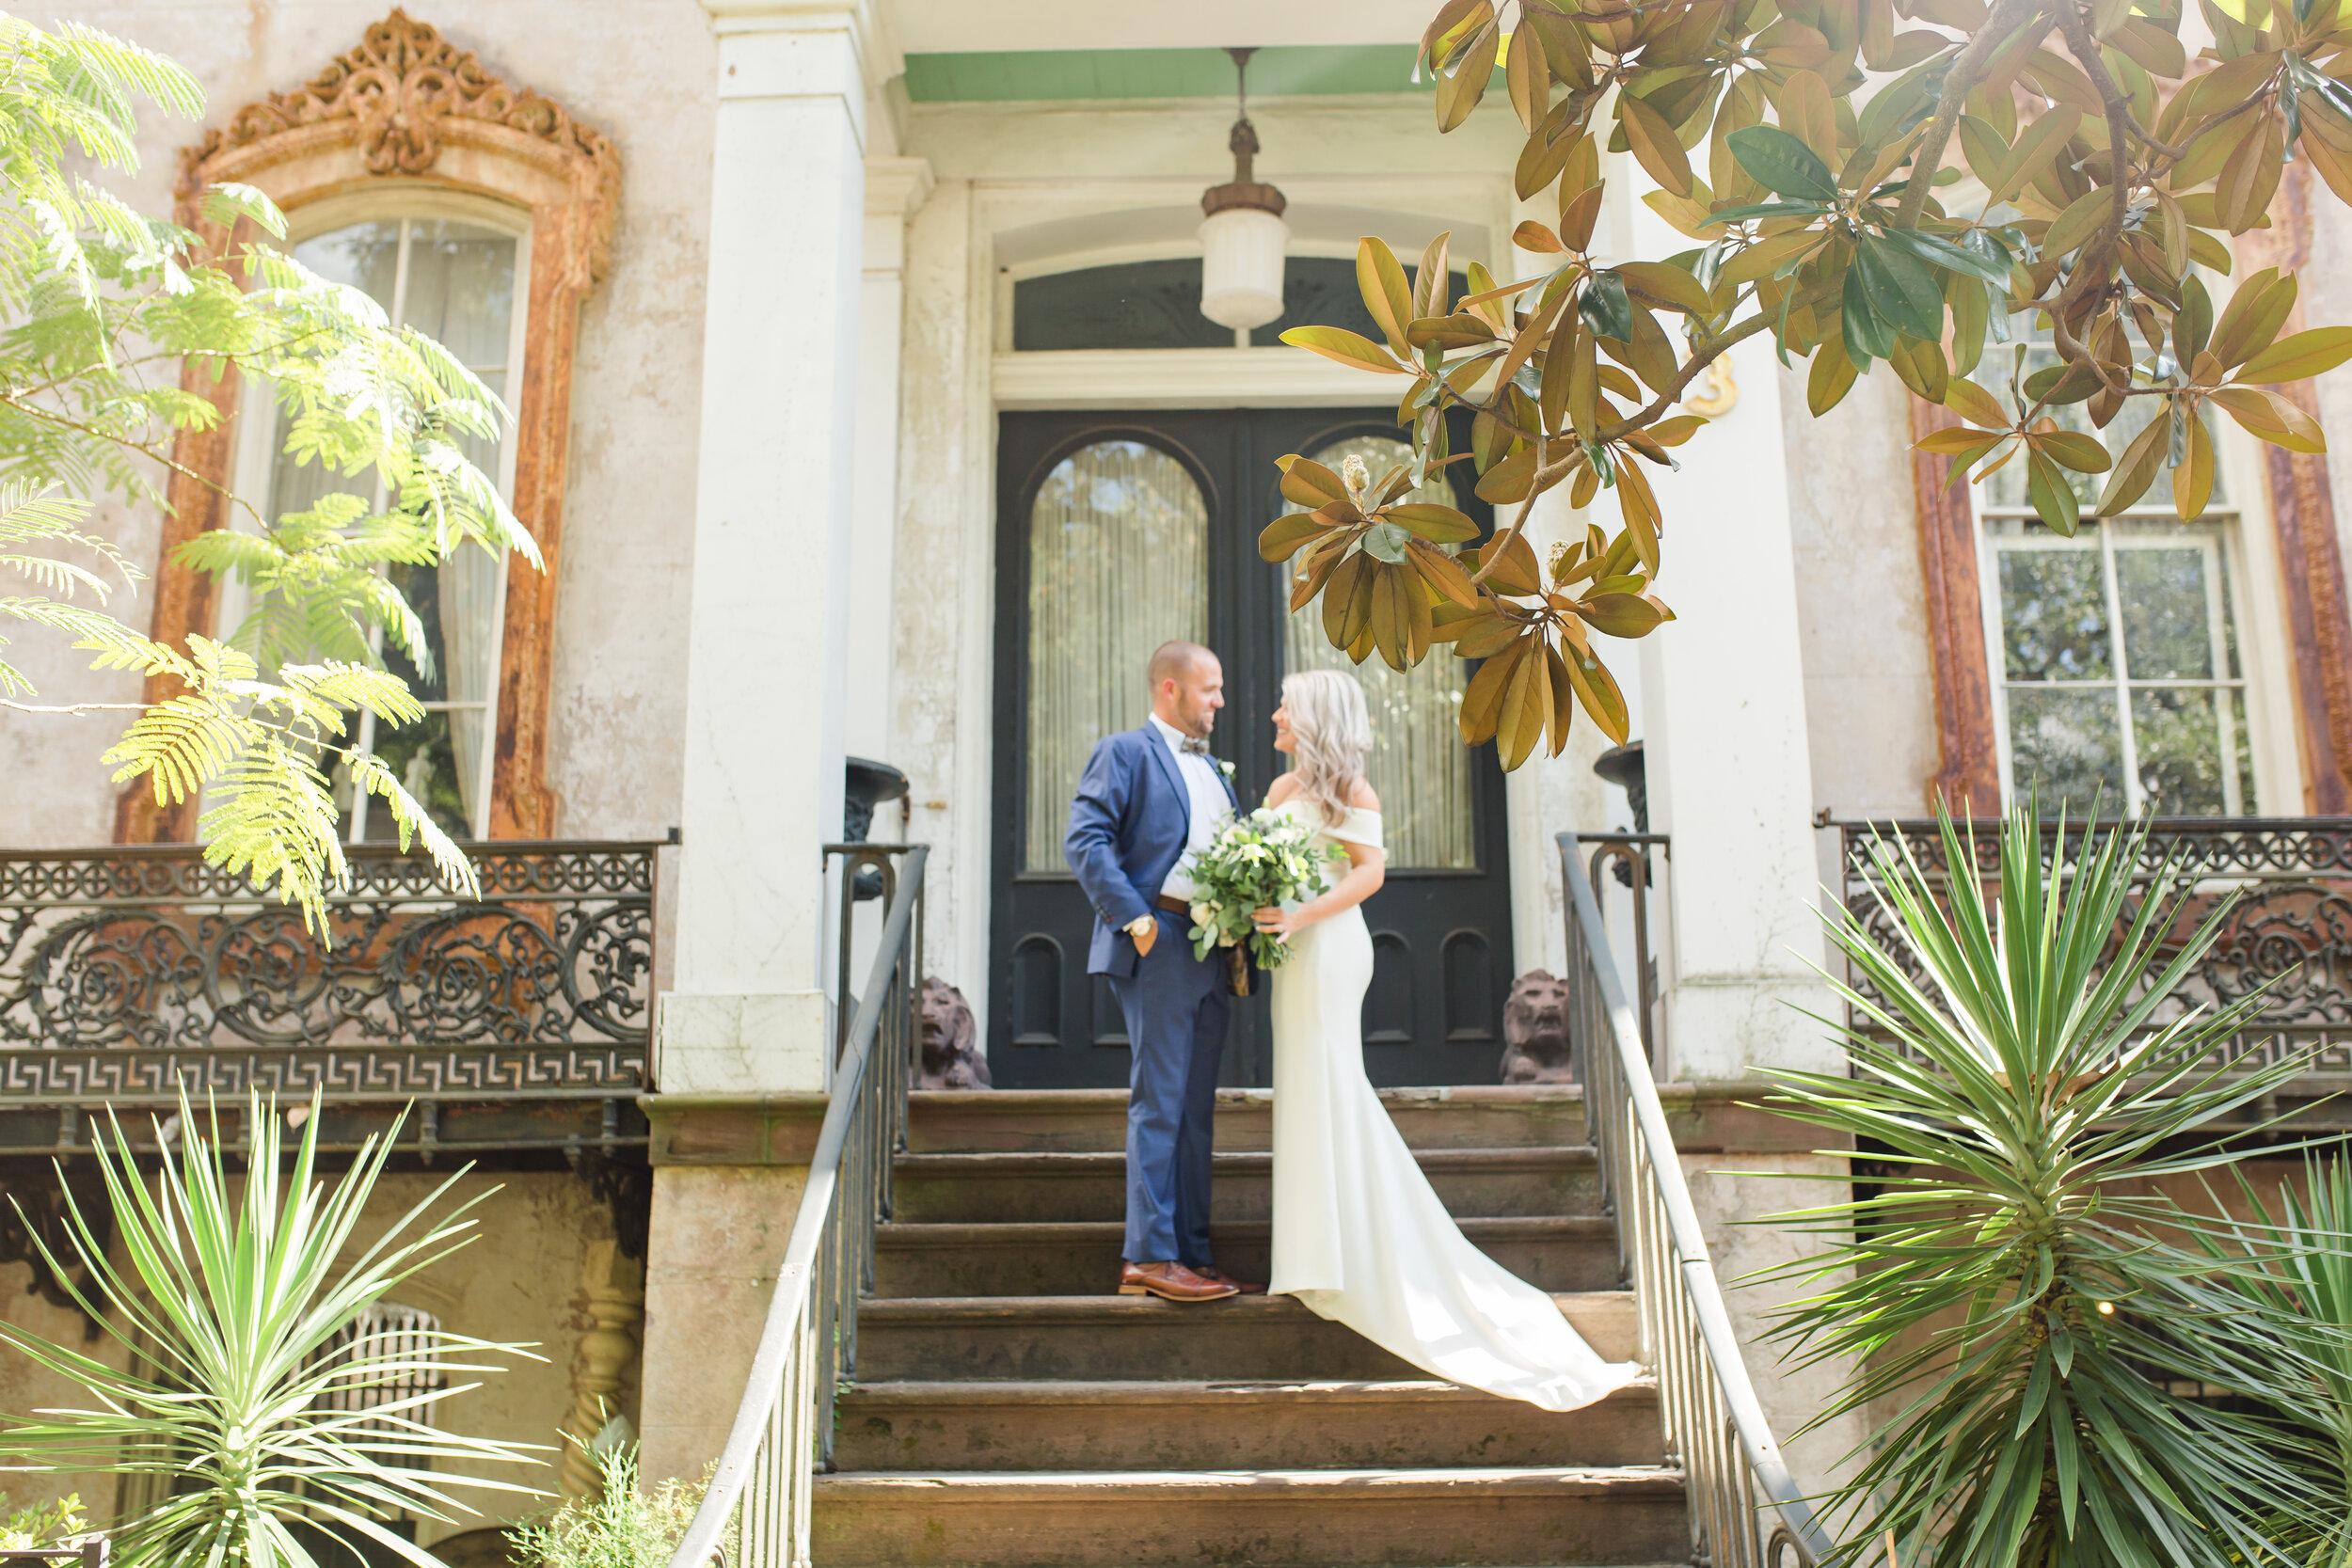 ivory-and-beau-bride-wedding-dresses-bridal-boutique-bridal-shop-savannah-wedding-shop-DGP_SohoSouthCafe_Swanagin-Mullis-174.JPG